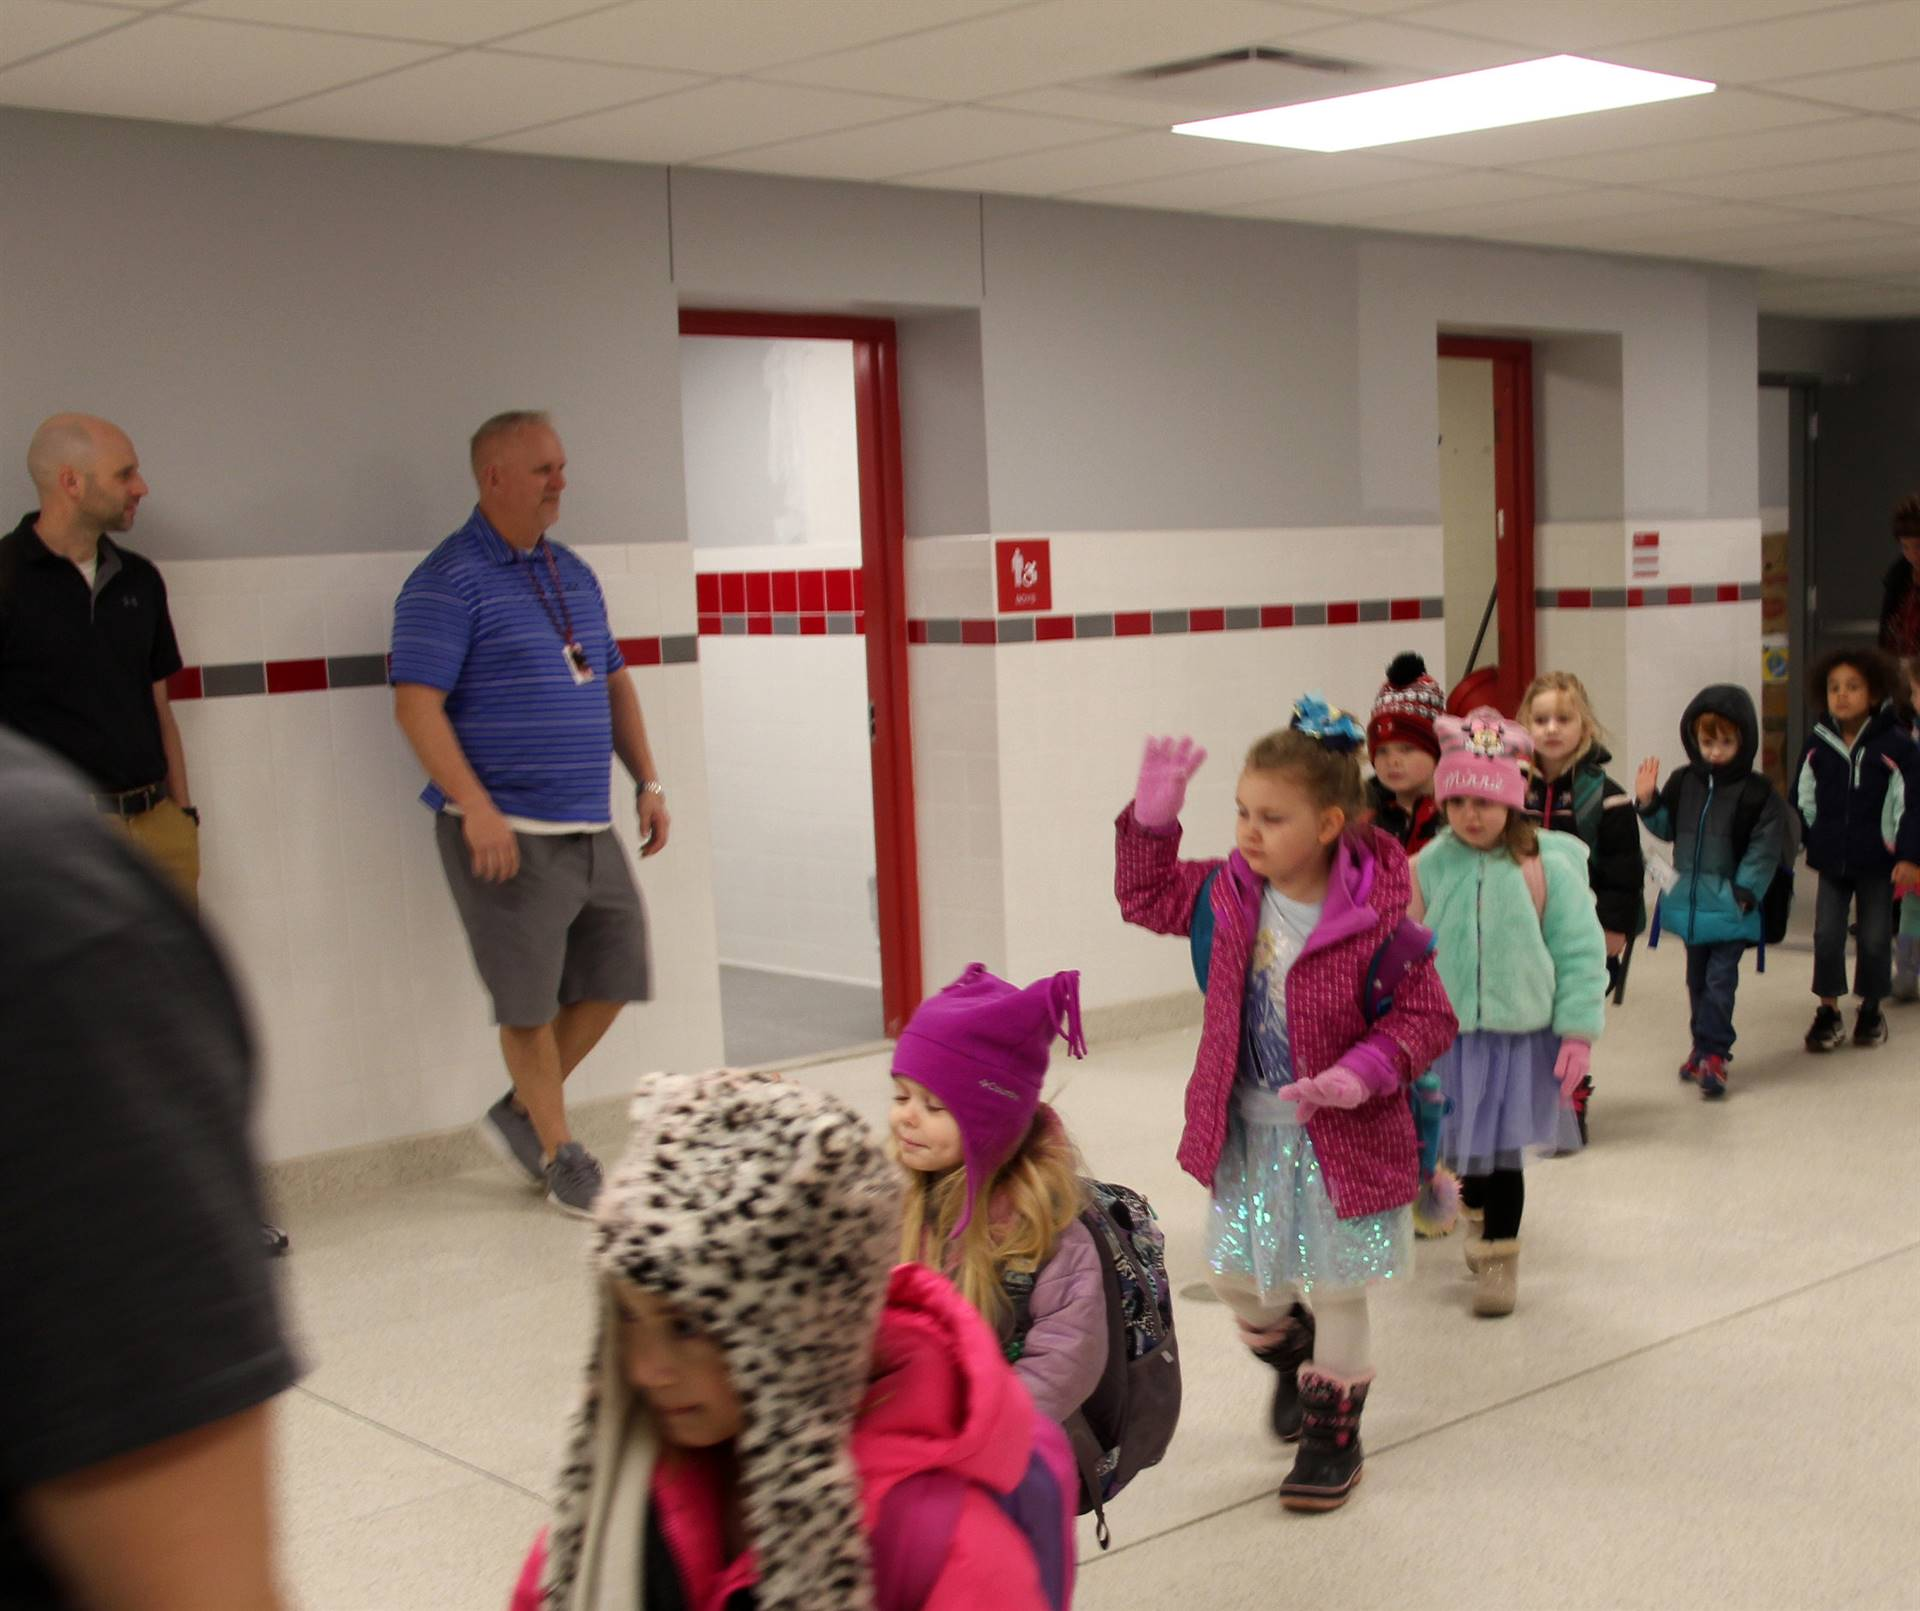 students waving in hallway